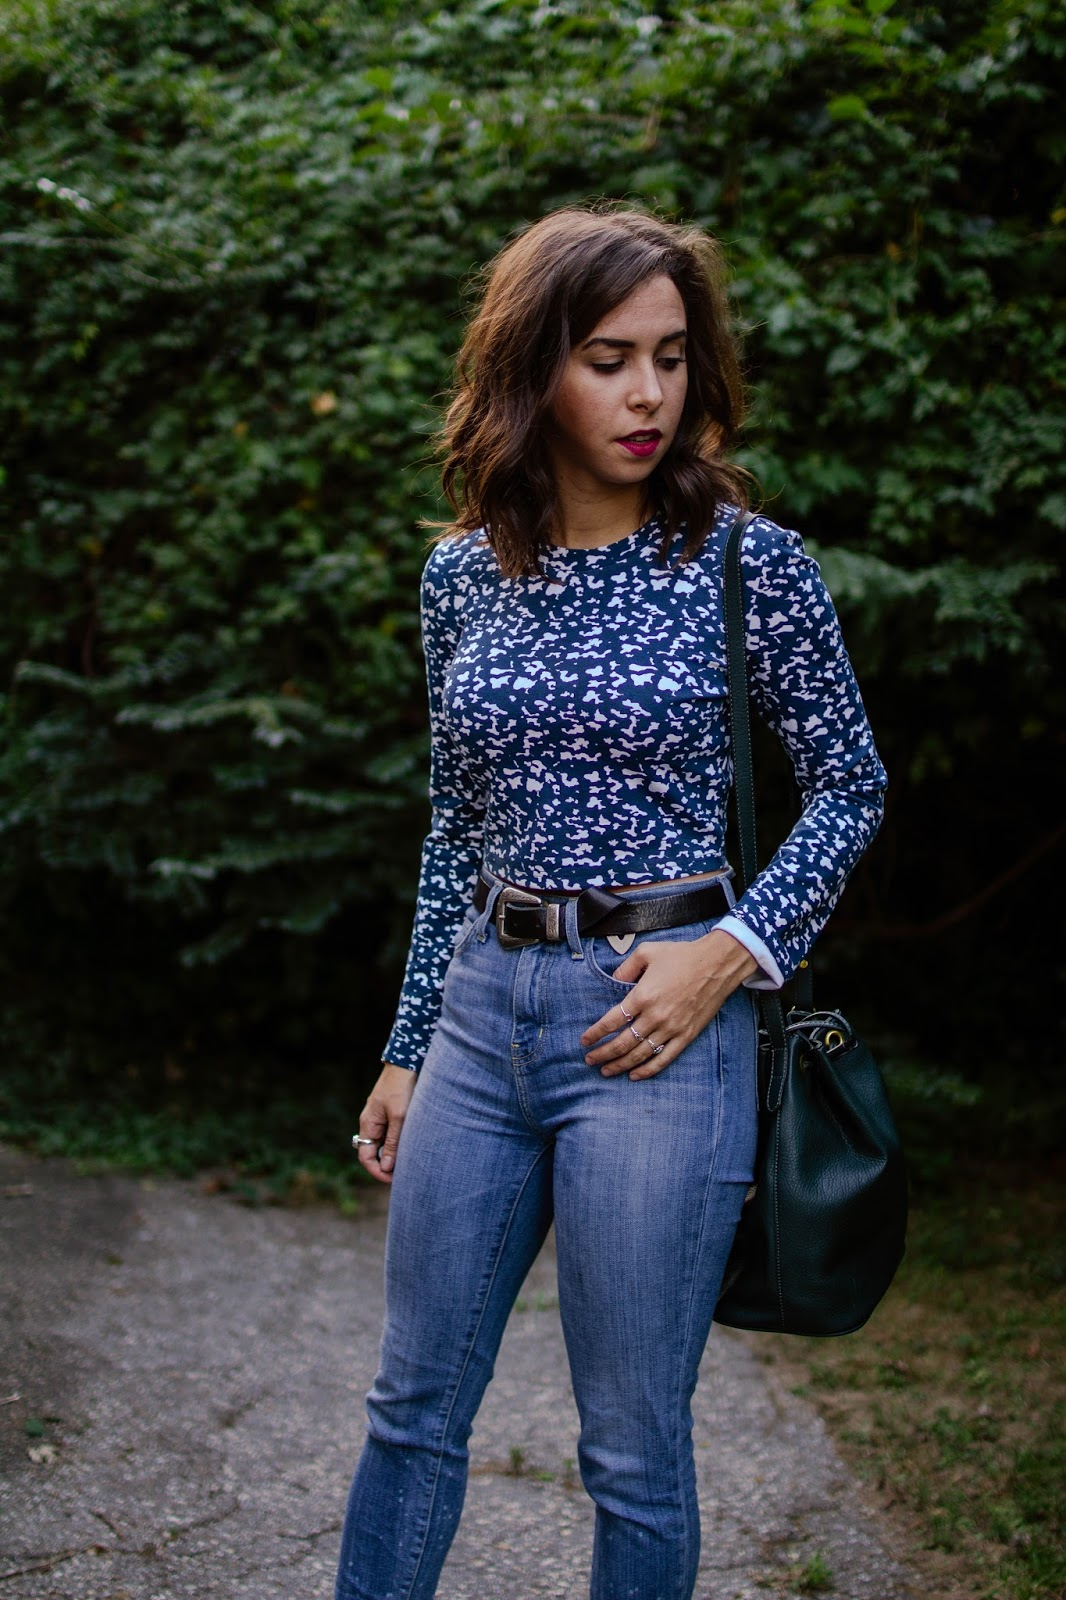 long-sleeve-crop-top-high-waist-current-elliott-ootd-casual-style-